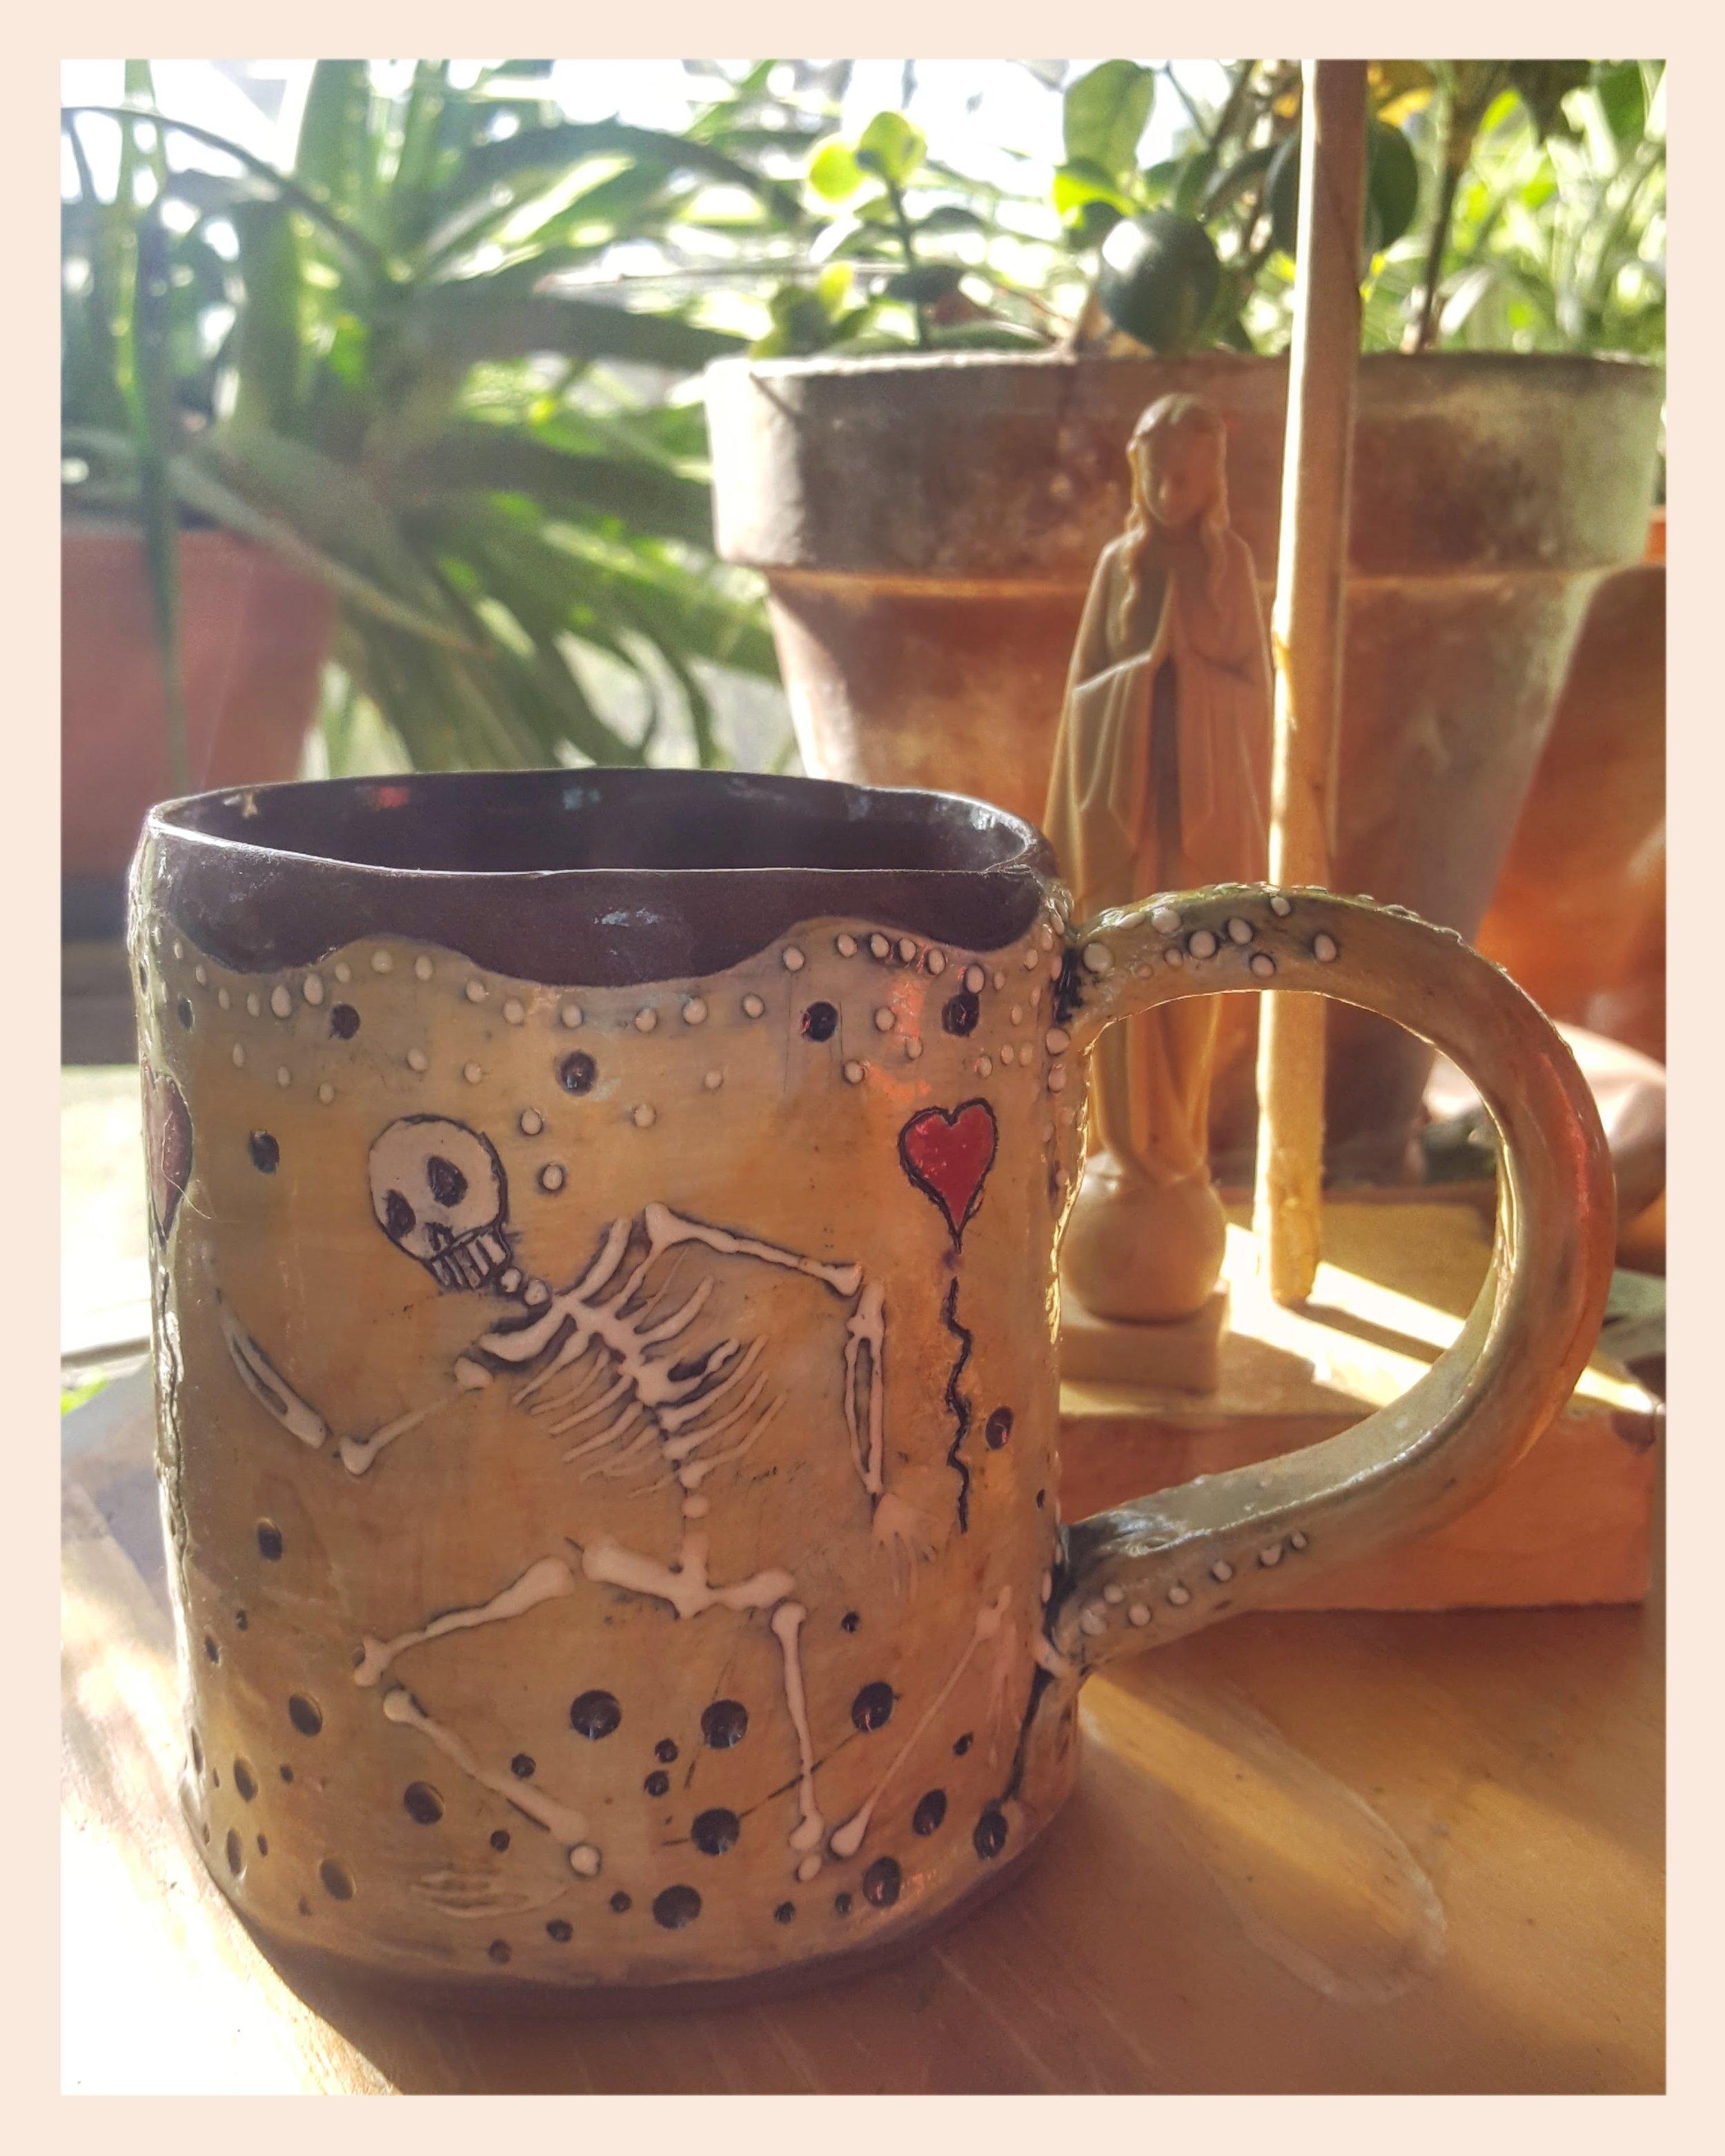 This is an amazing skeleton tea cup from  Sandra Civitarese of Pigasus Art Studio